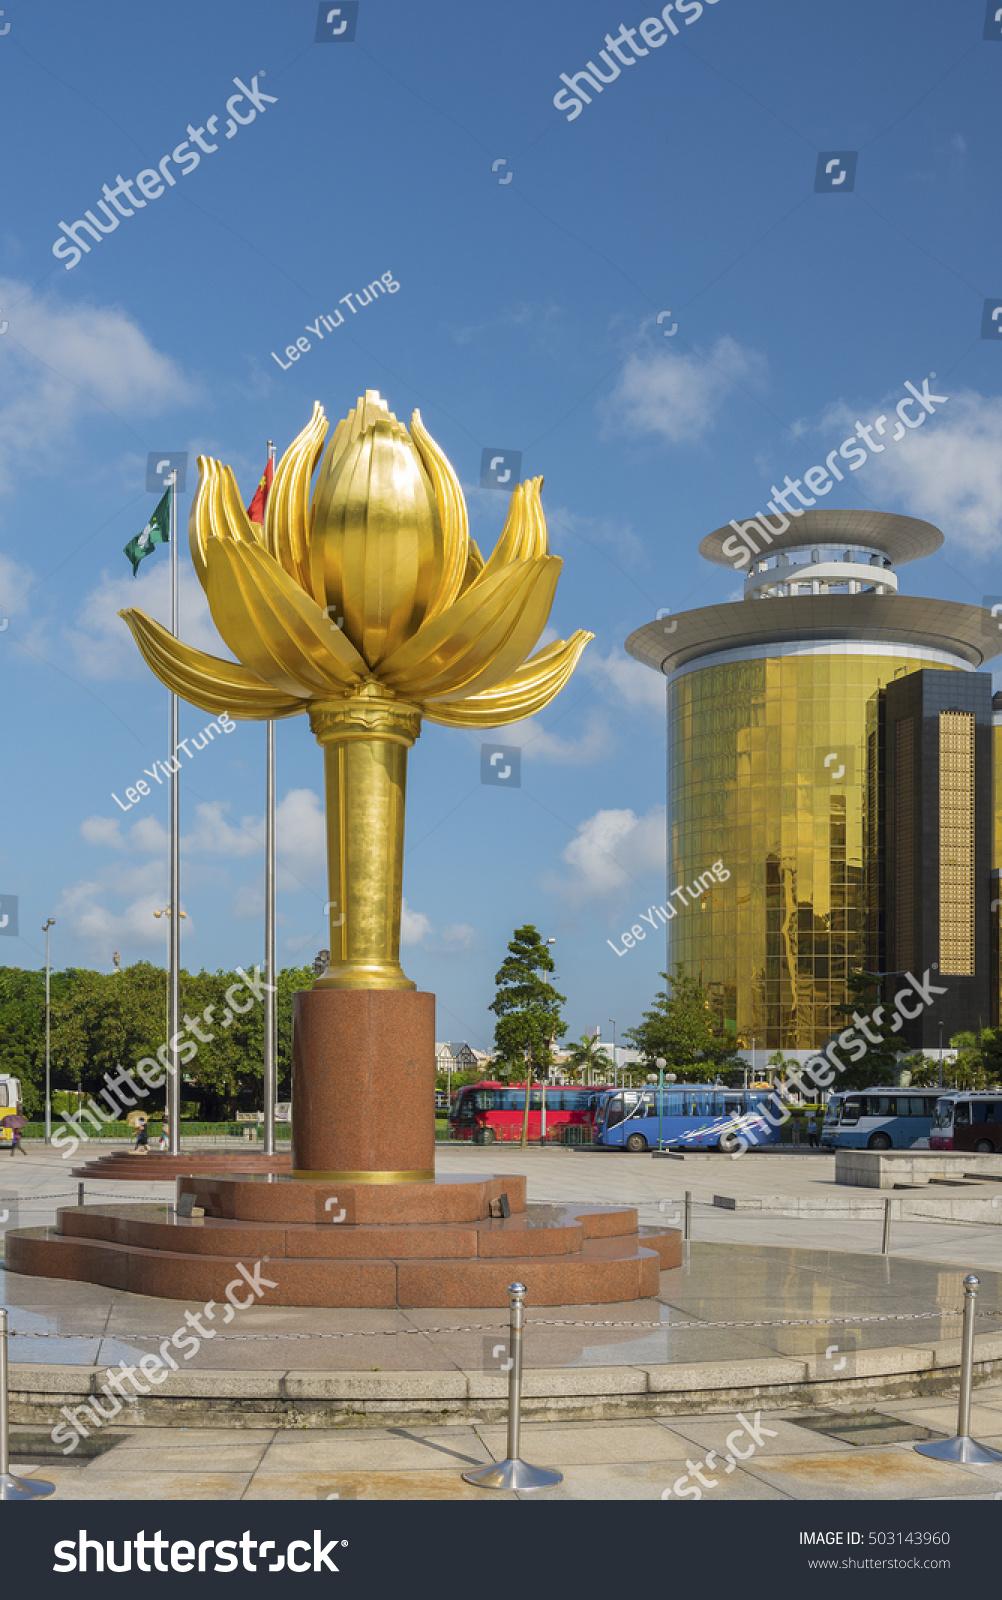 Lotus flower full bloom statue macau stock photo edit now lotus flower in full bloom statue at macau golden lotus square izmirmasajfo